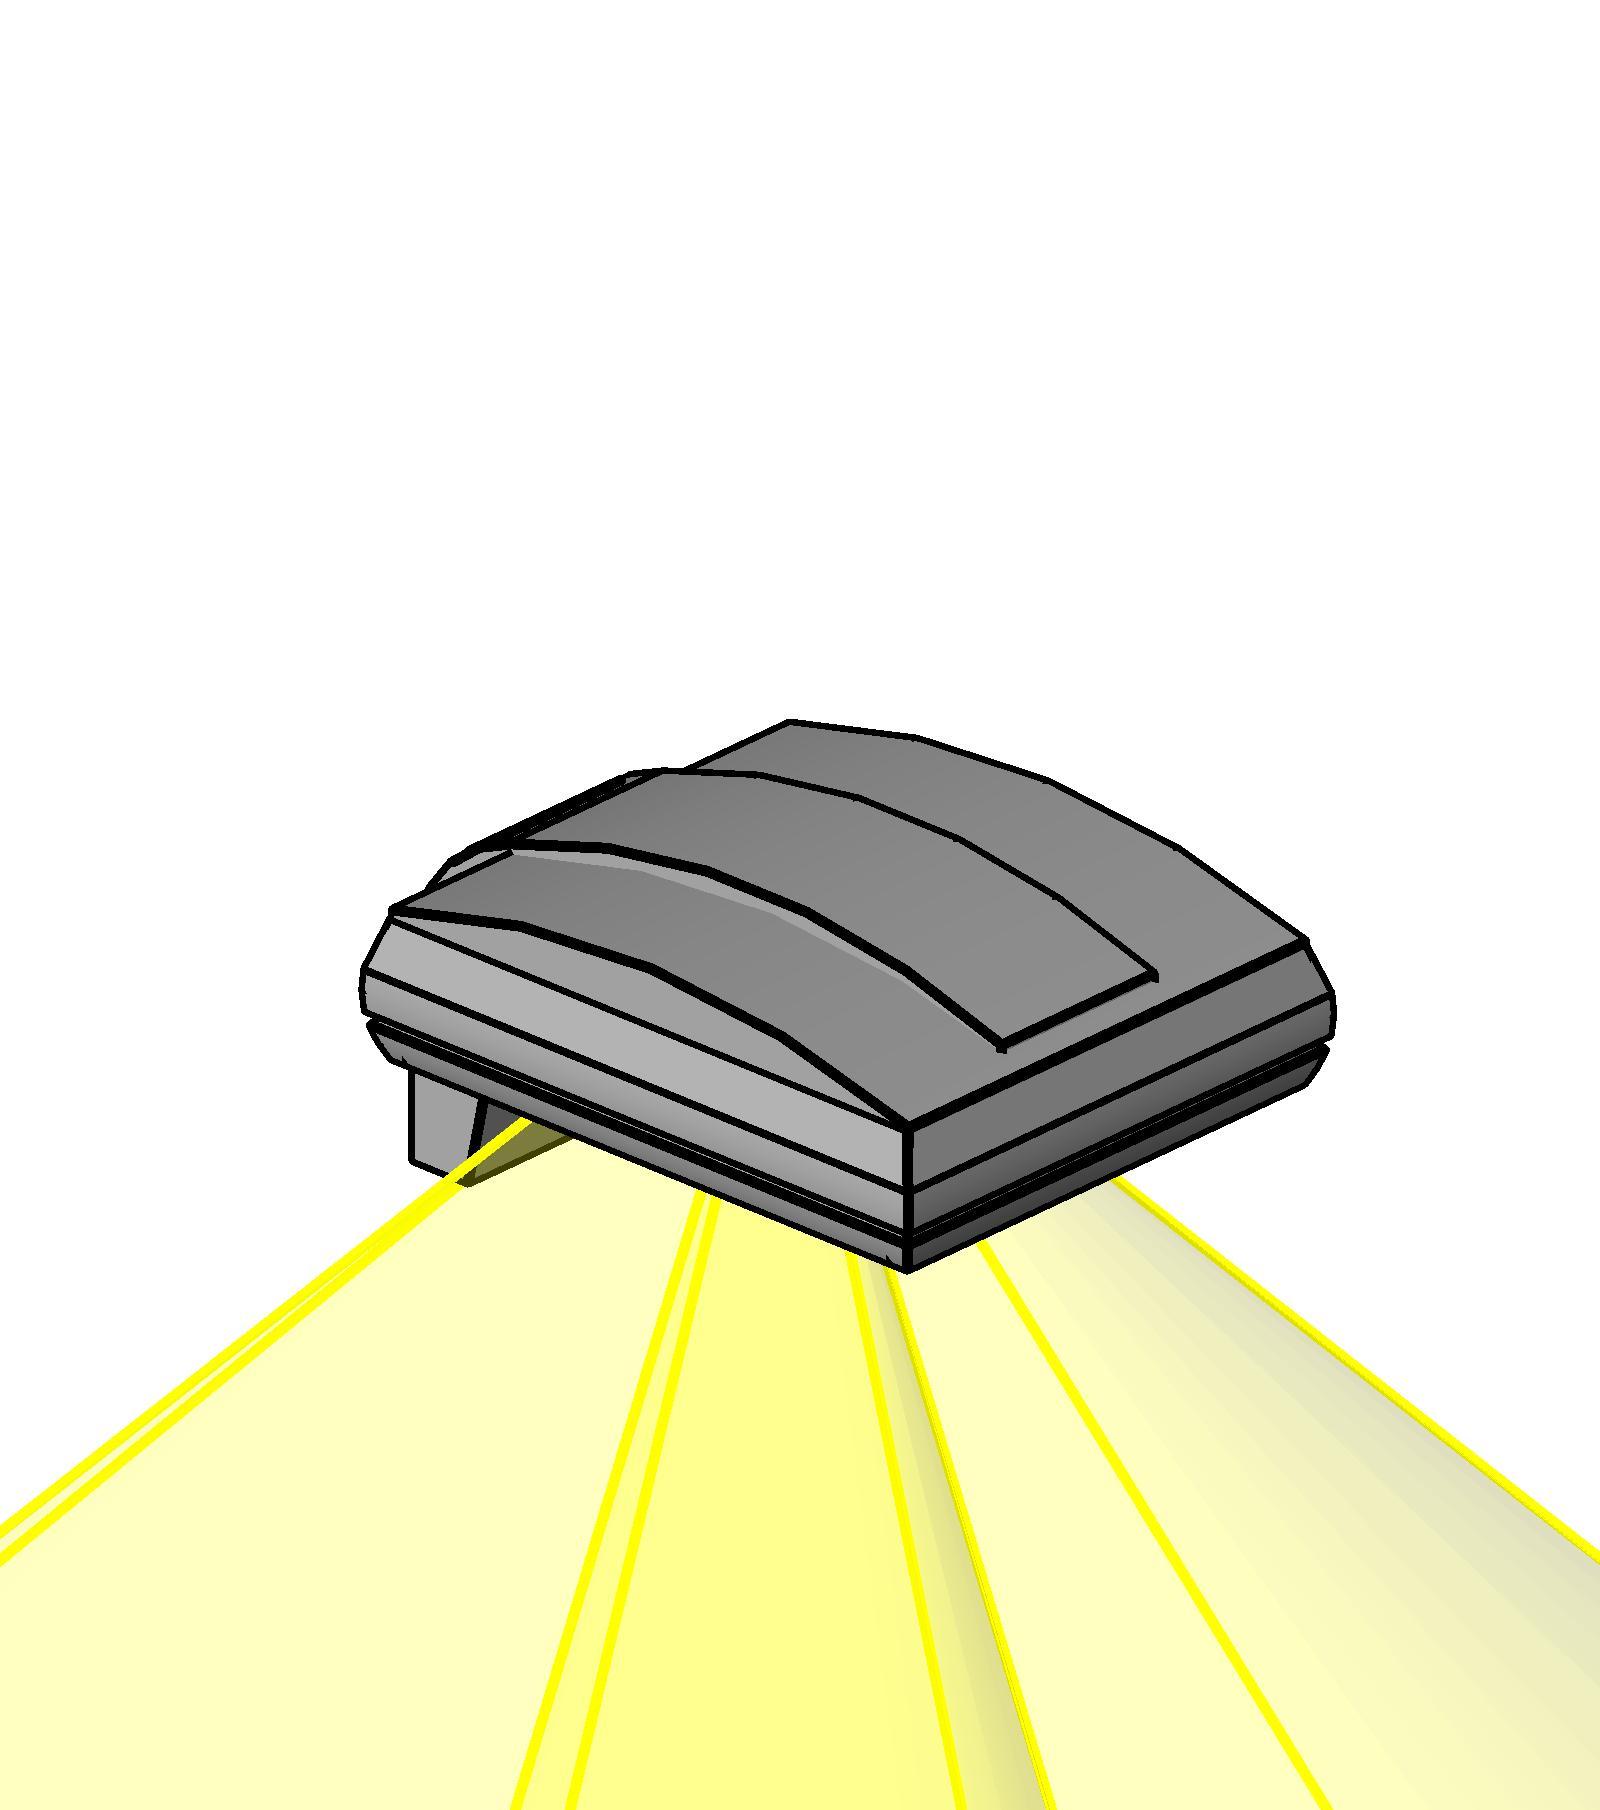 Outdoor Lighting Revit: BIM Objects / Families